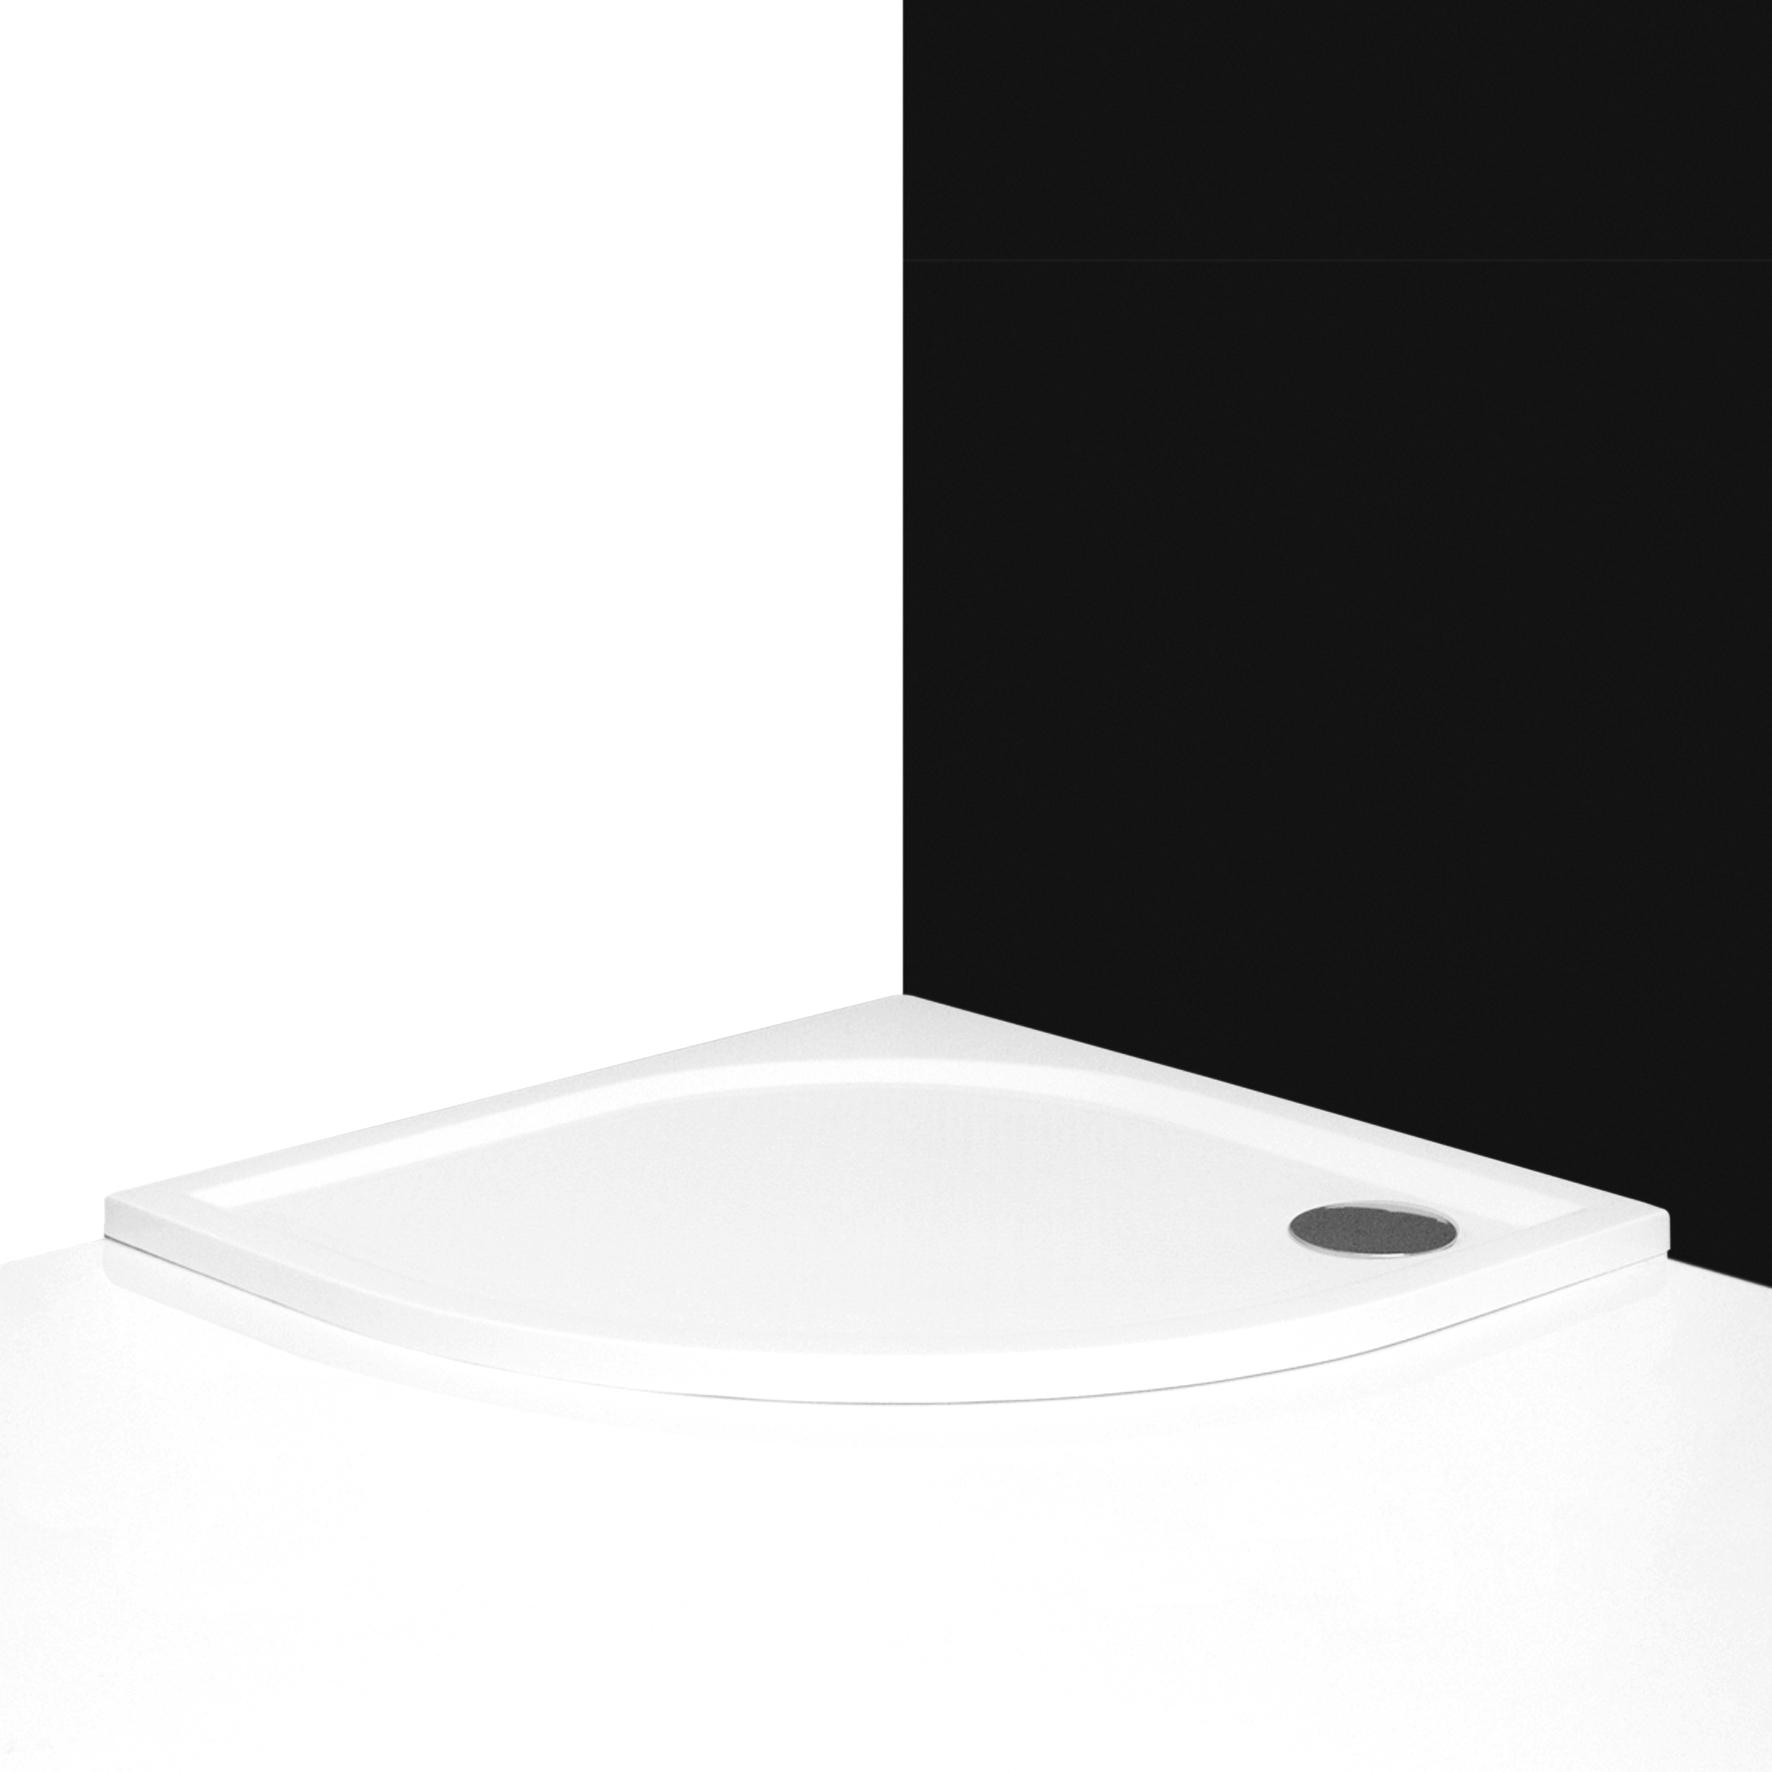 zuhanyt lca 90x90 m rv ny rg p. Black Bedroom Furniture Sets. Home Design Ideas